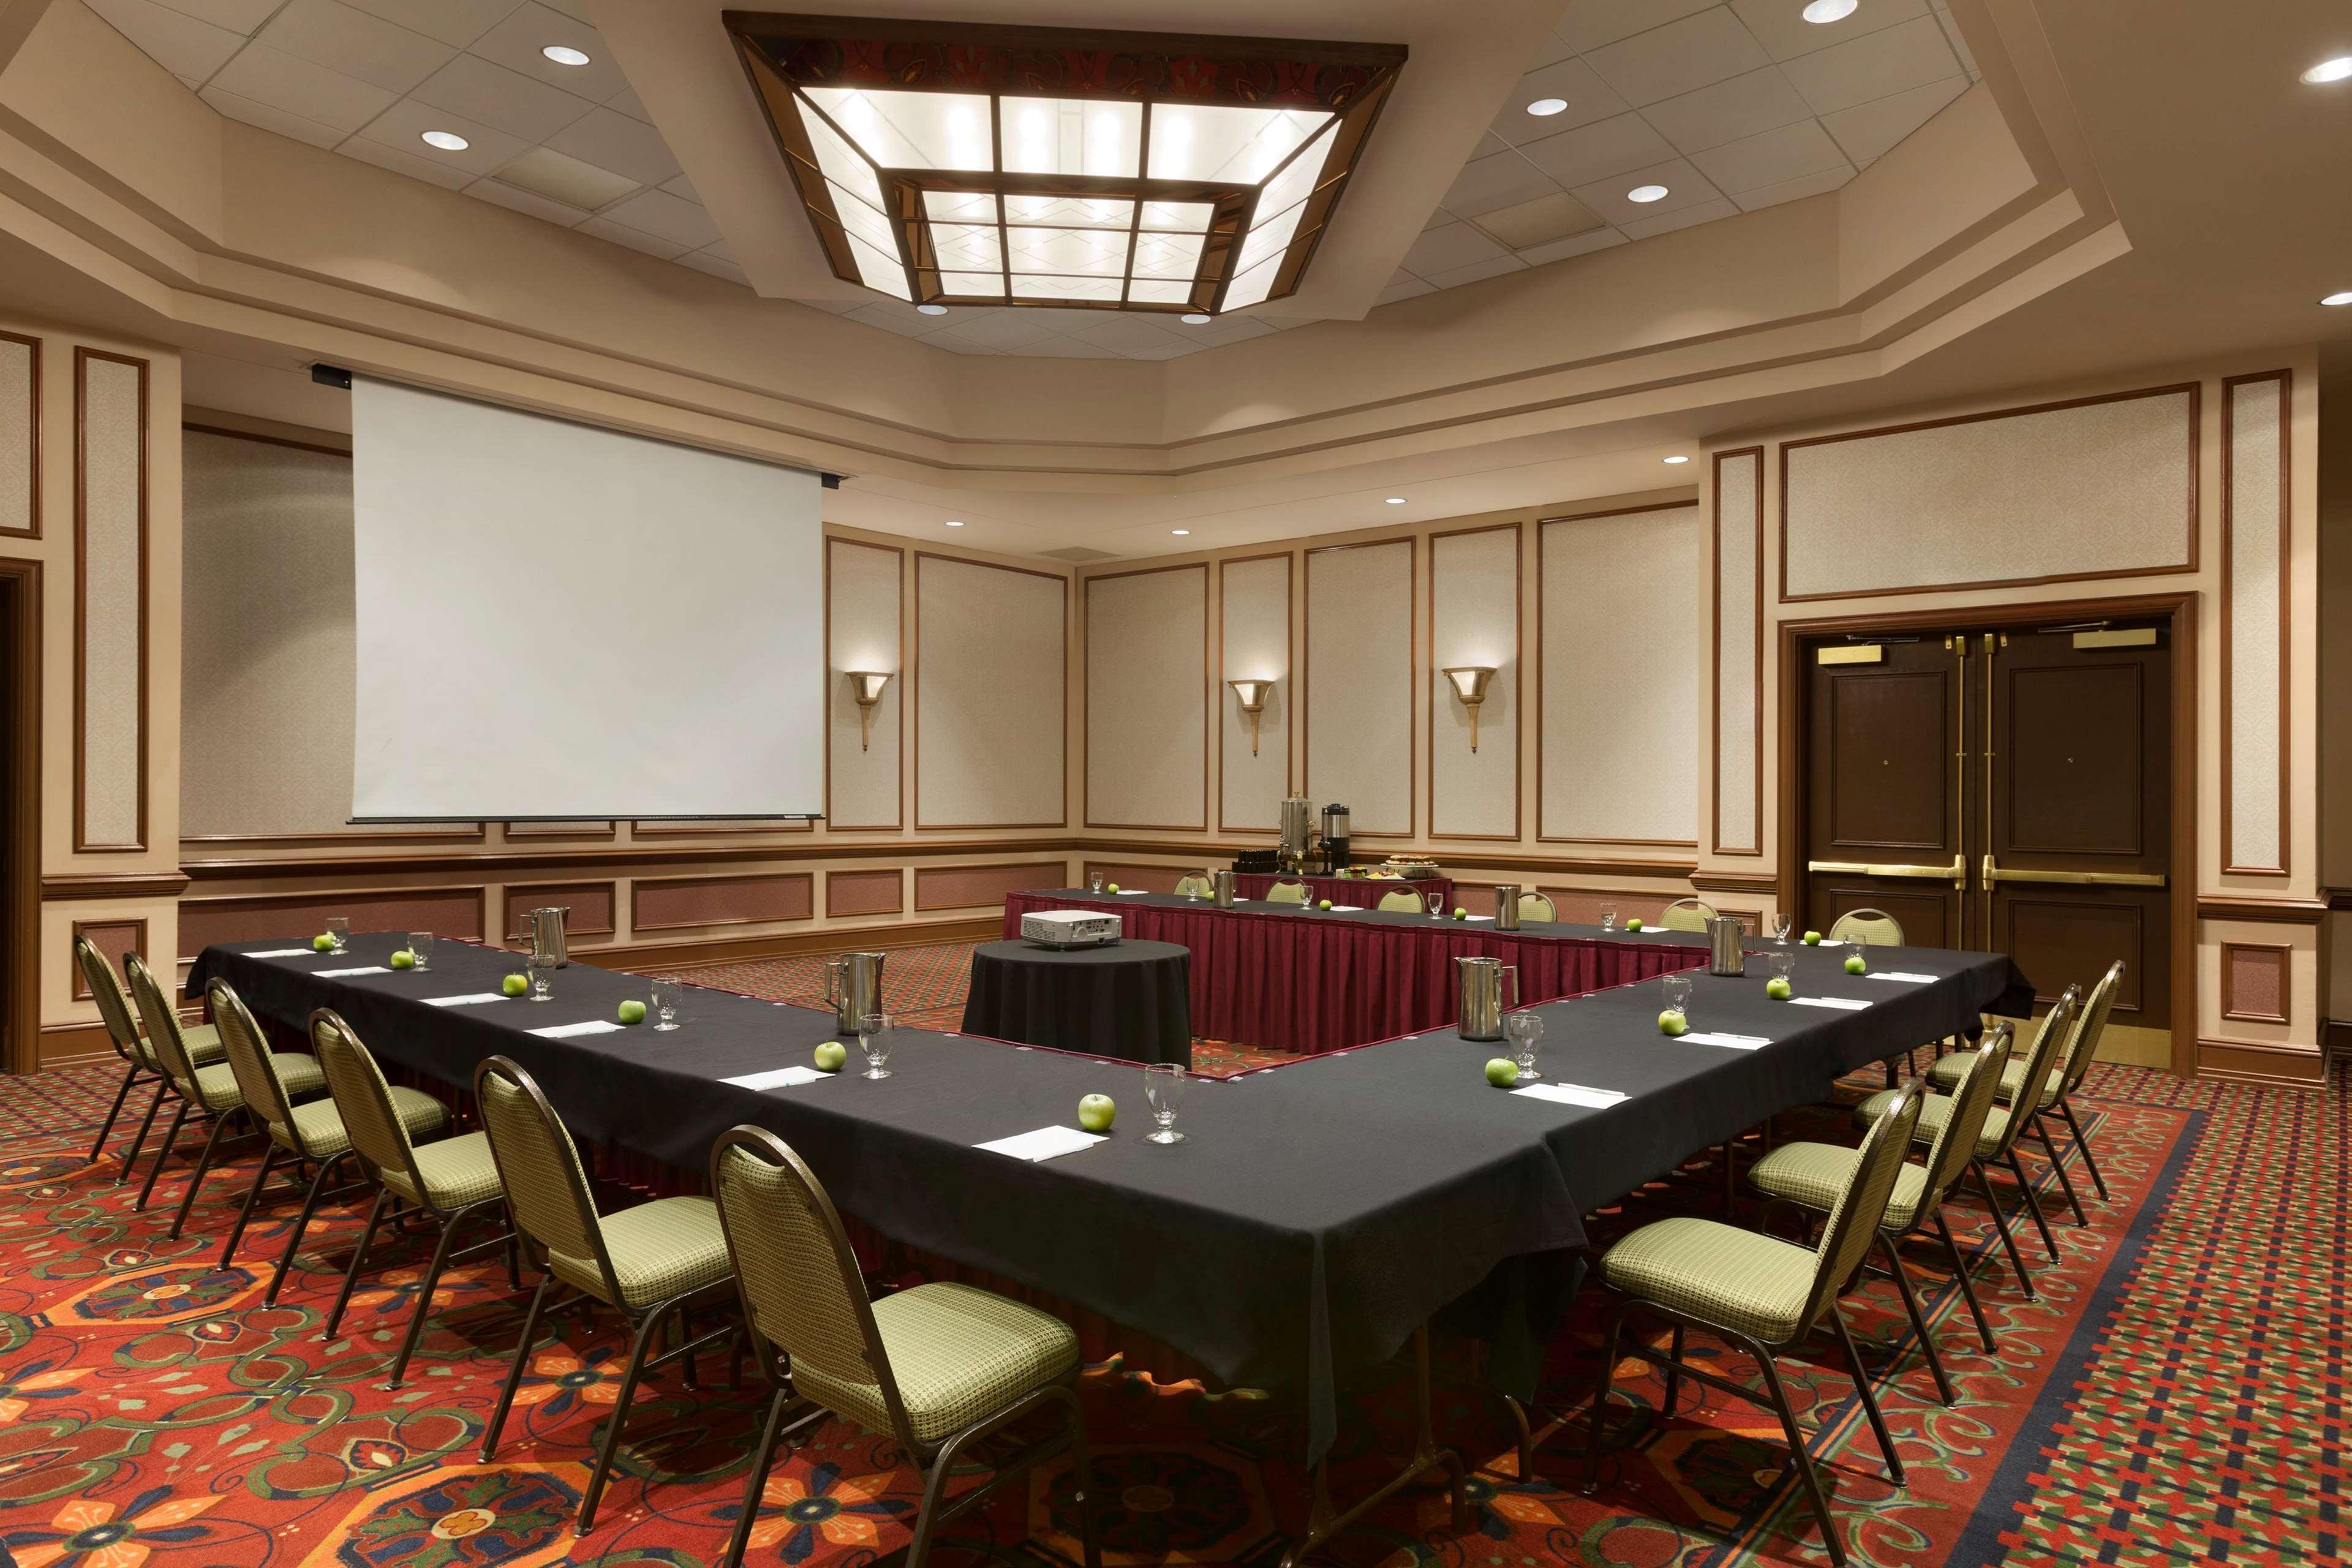 Embassy suites by hilton charleston charleston west for 712 salon charleston wv reviews